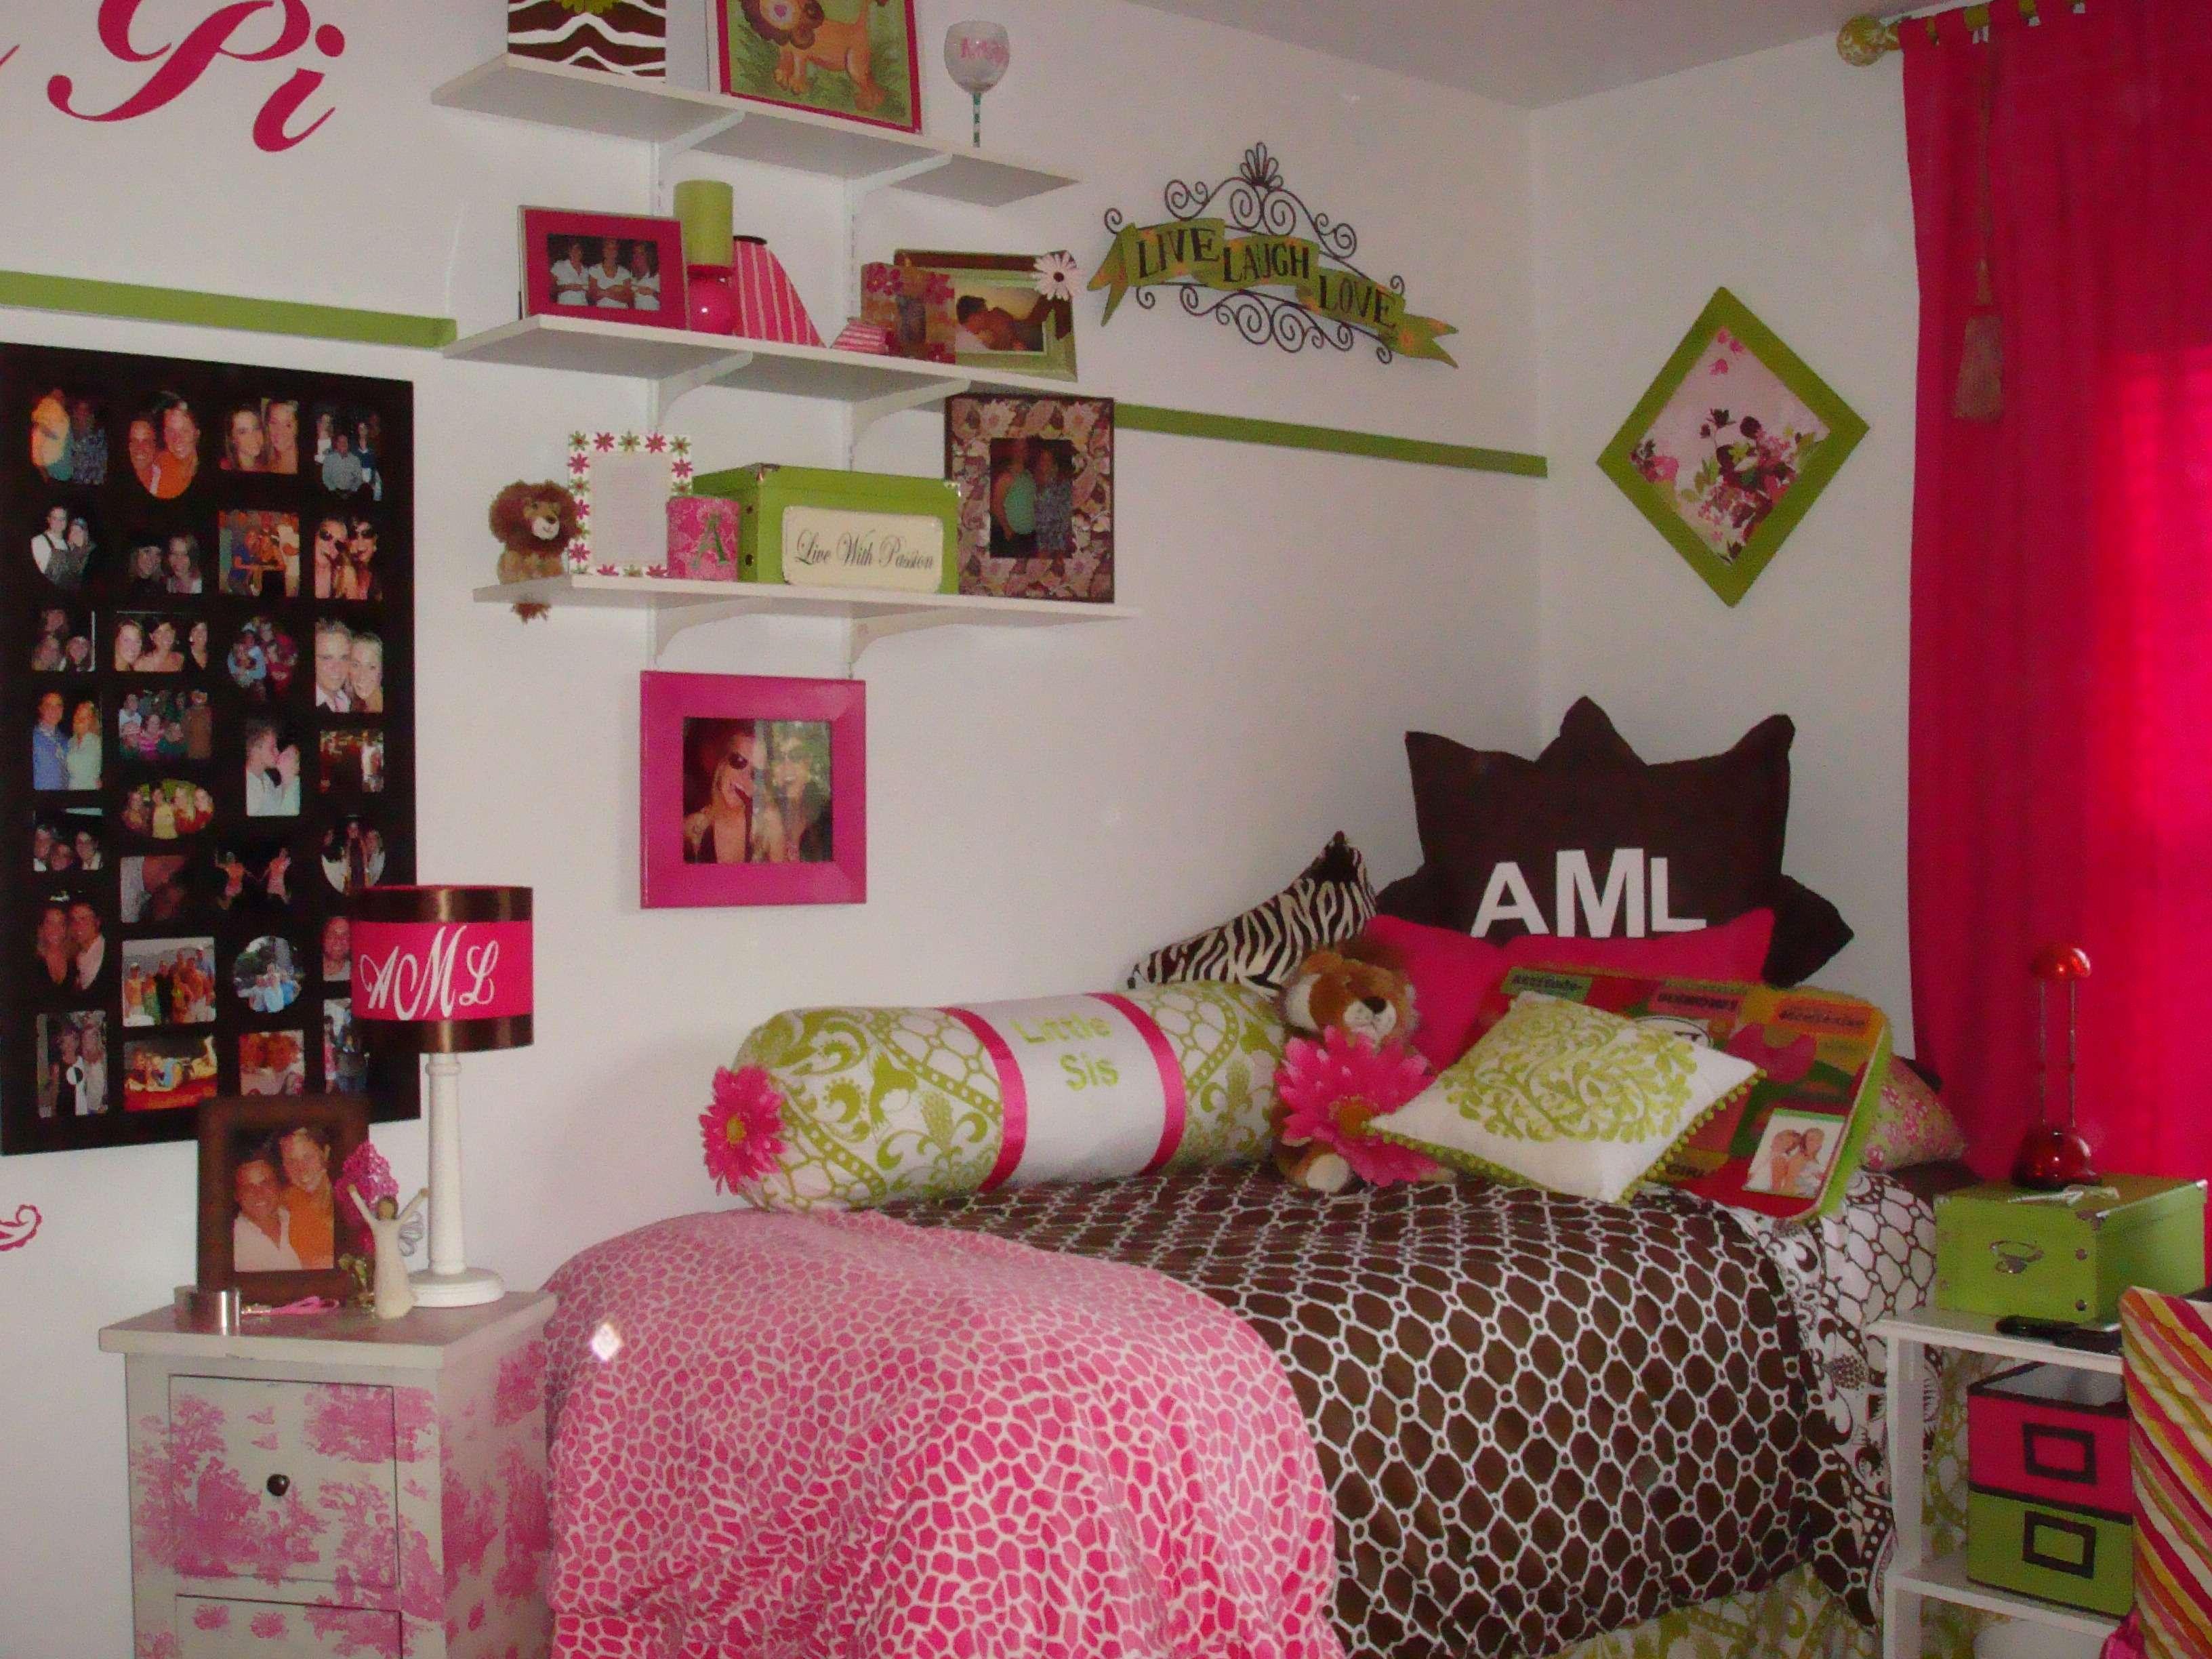 Dorm Room Decor Ideas Decorating Your College